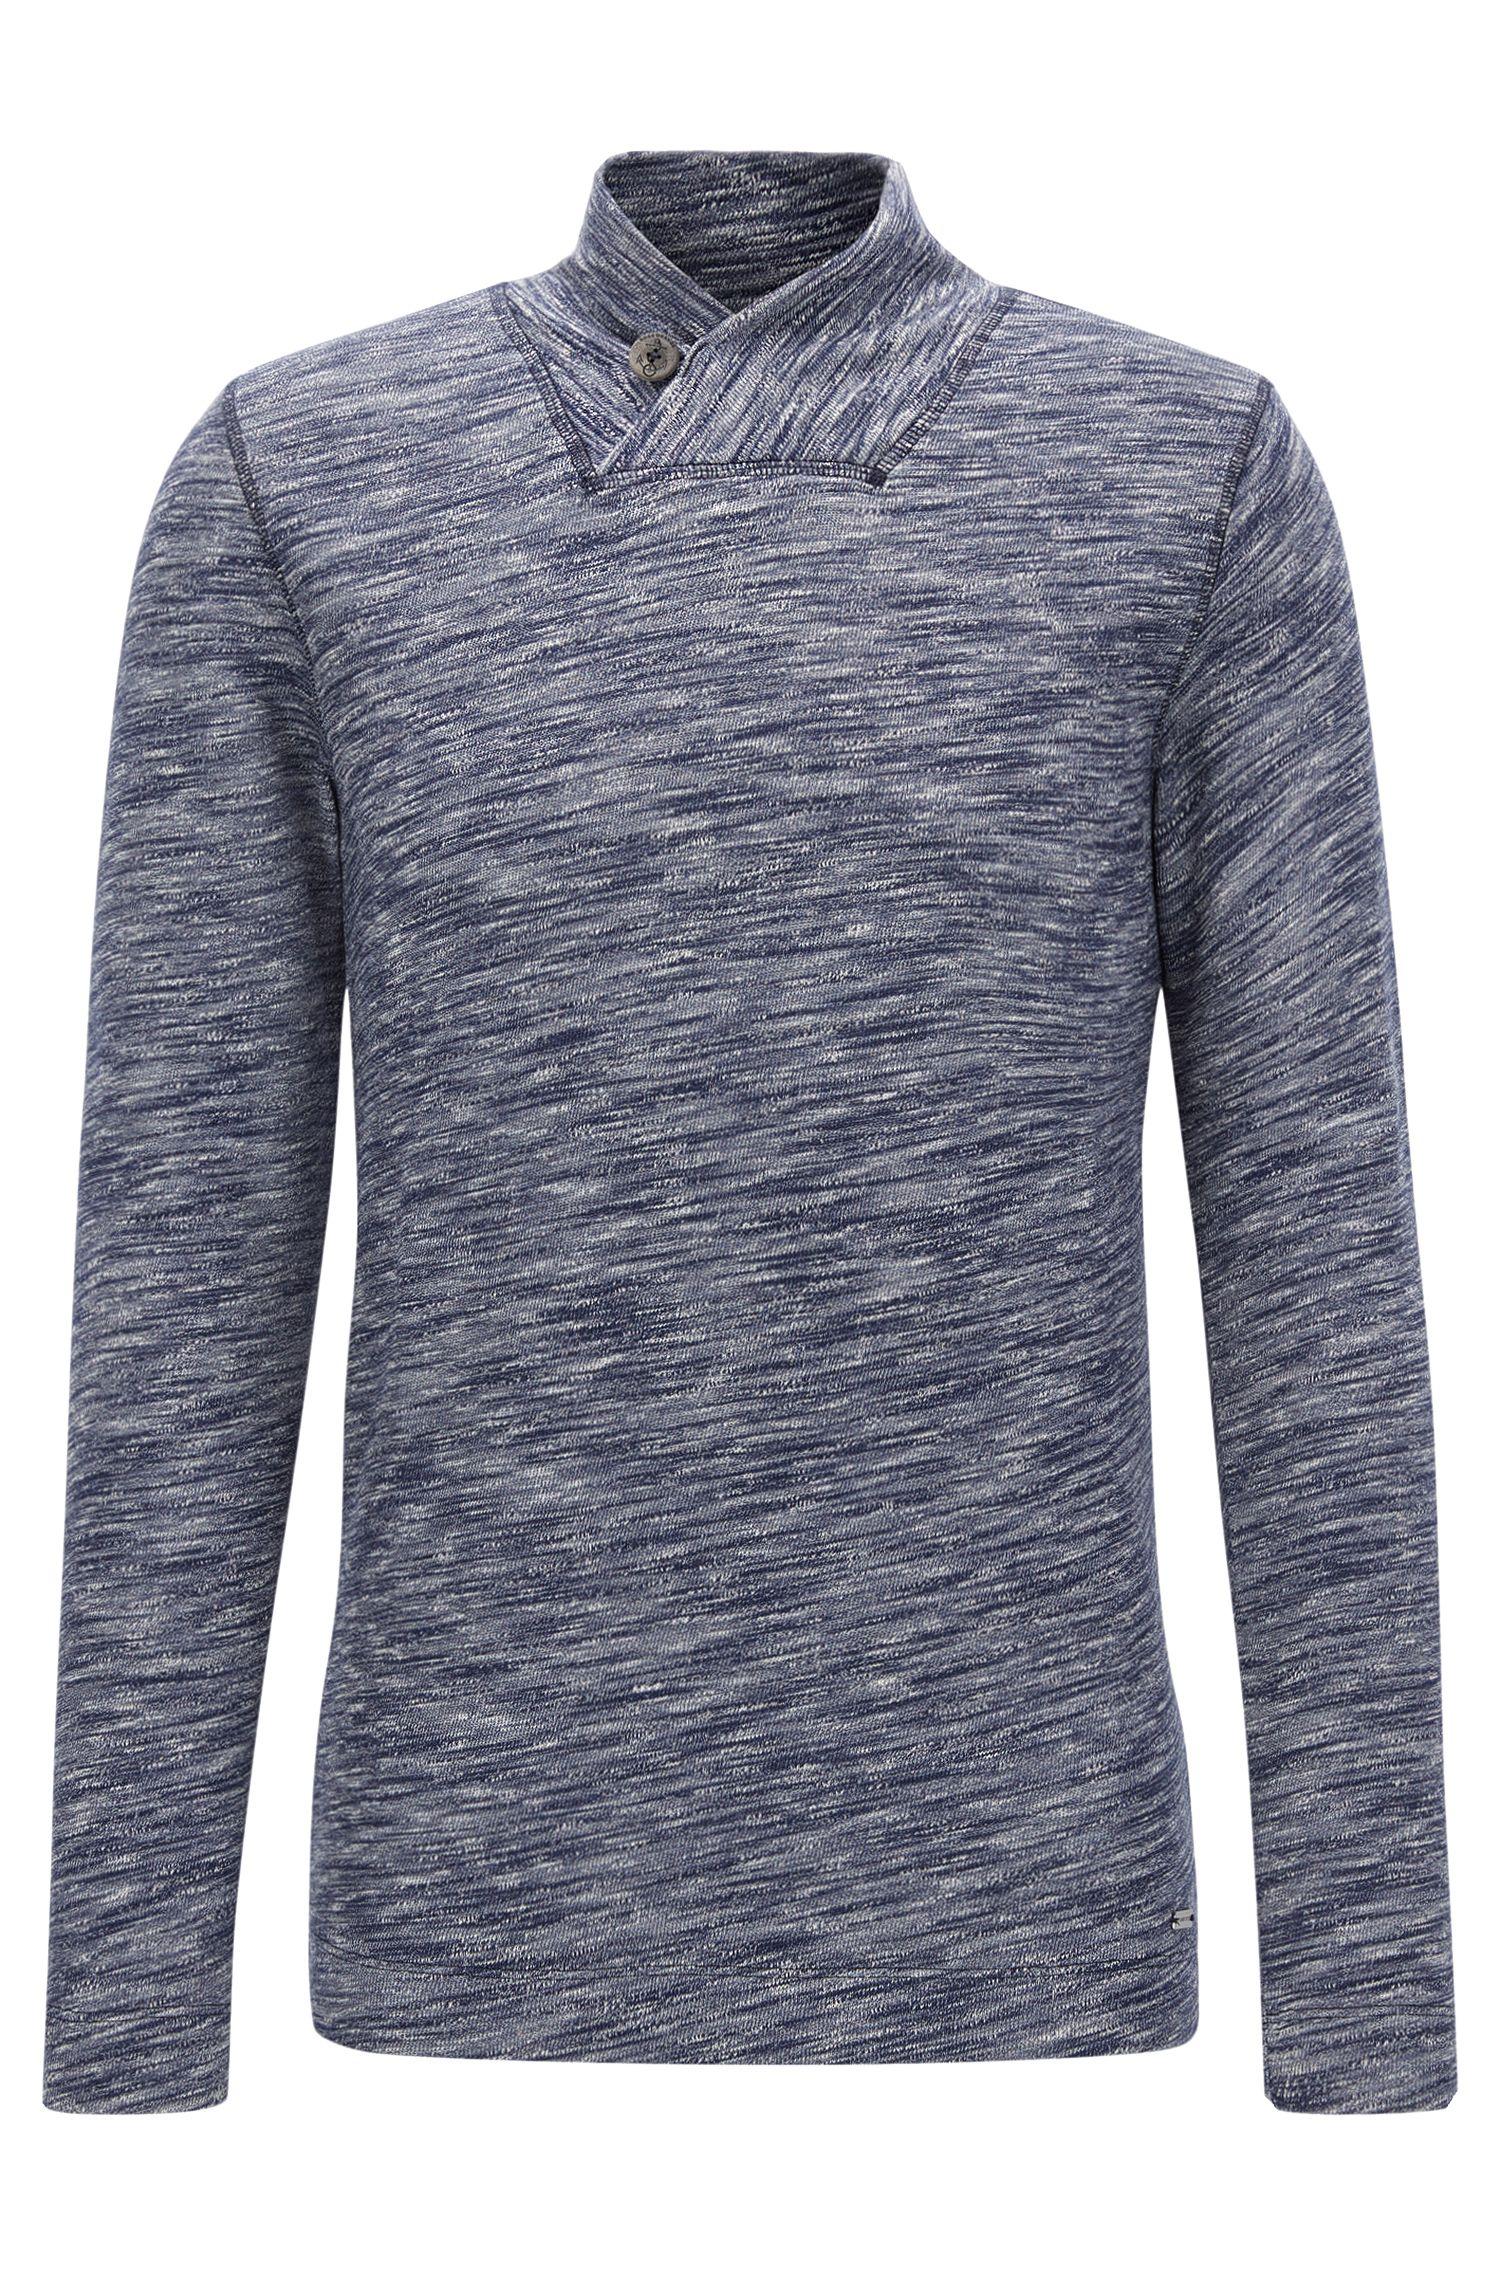 'Woolish' | Heathered Cotton Wool Jersey Sweater, Dark Blue